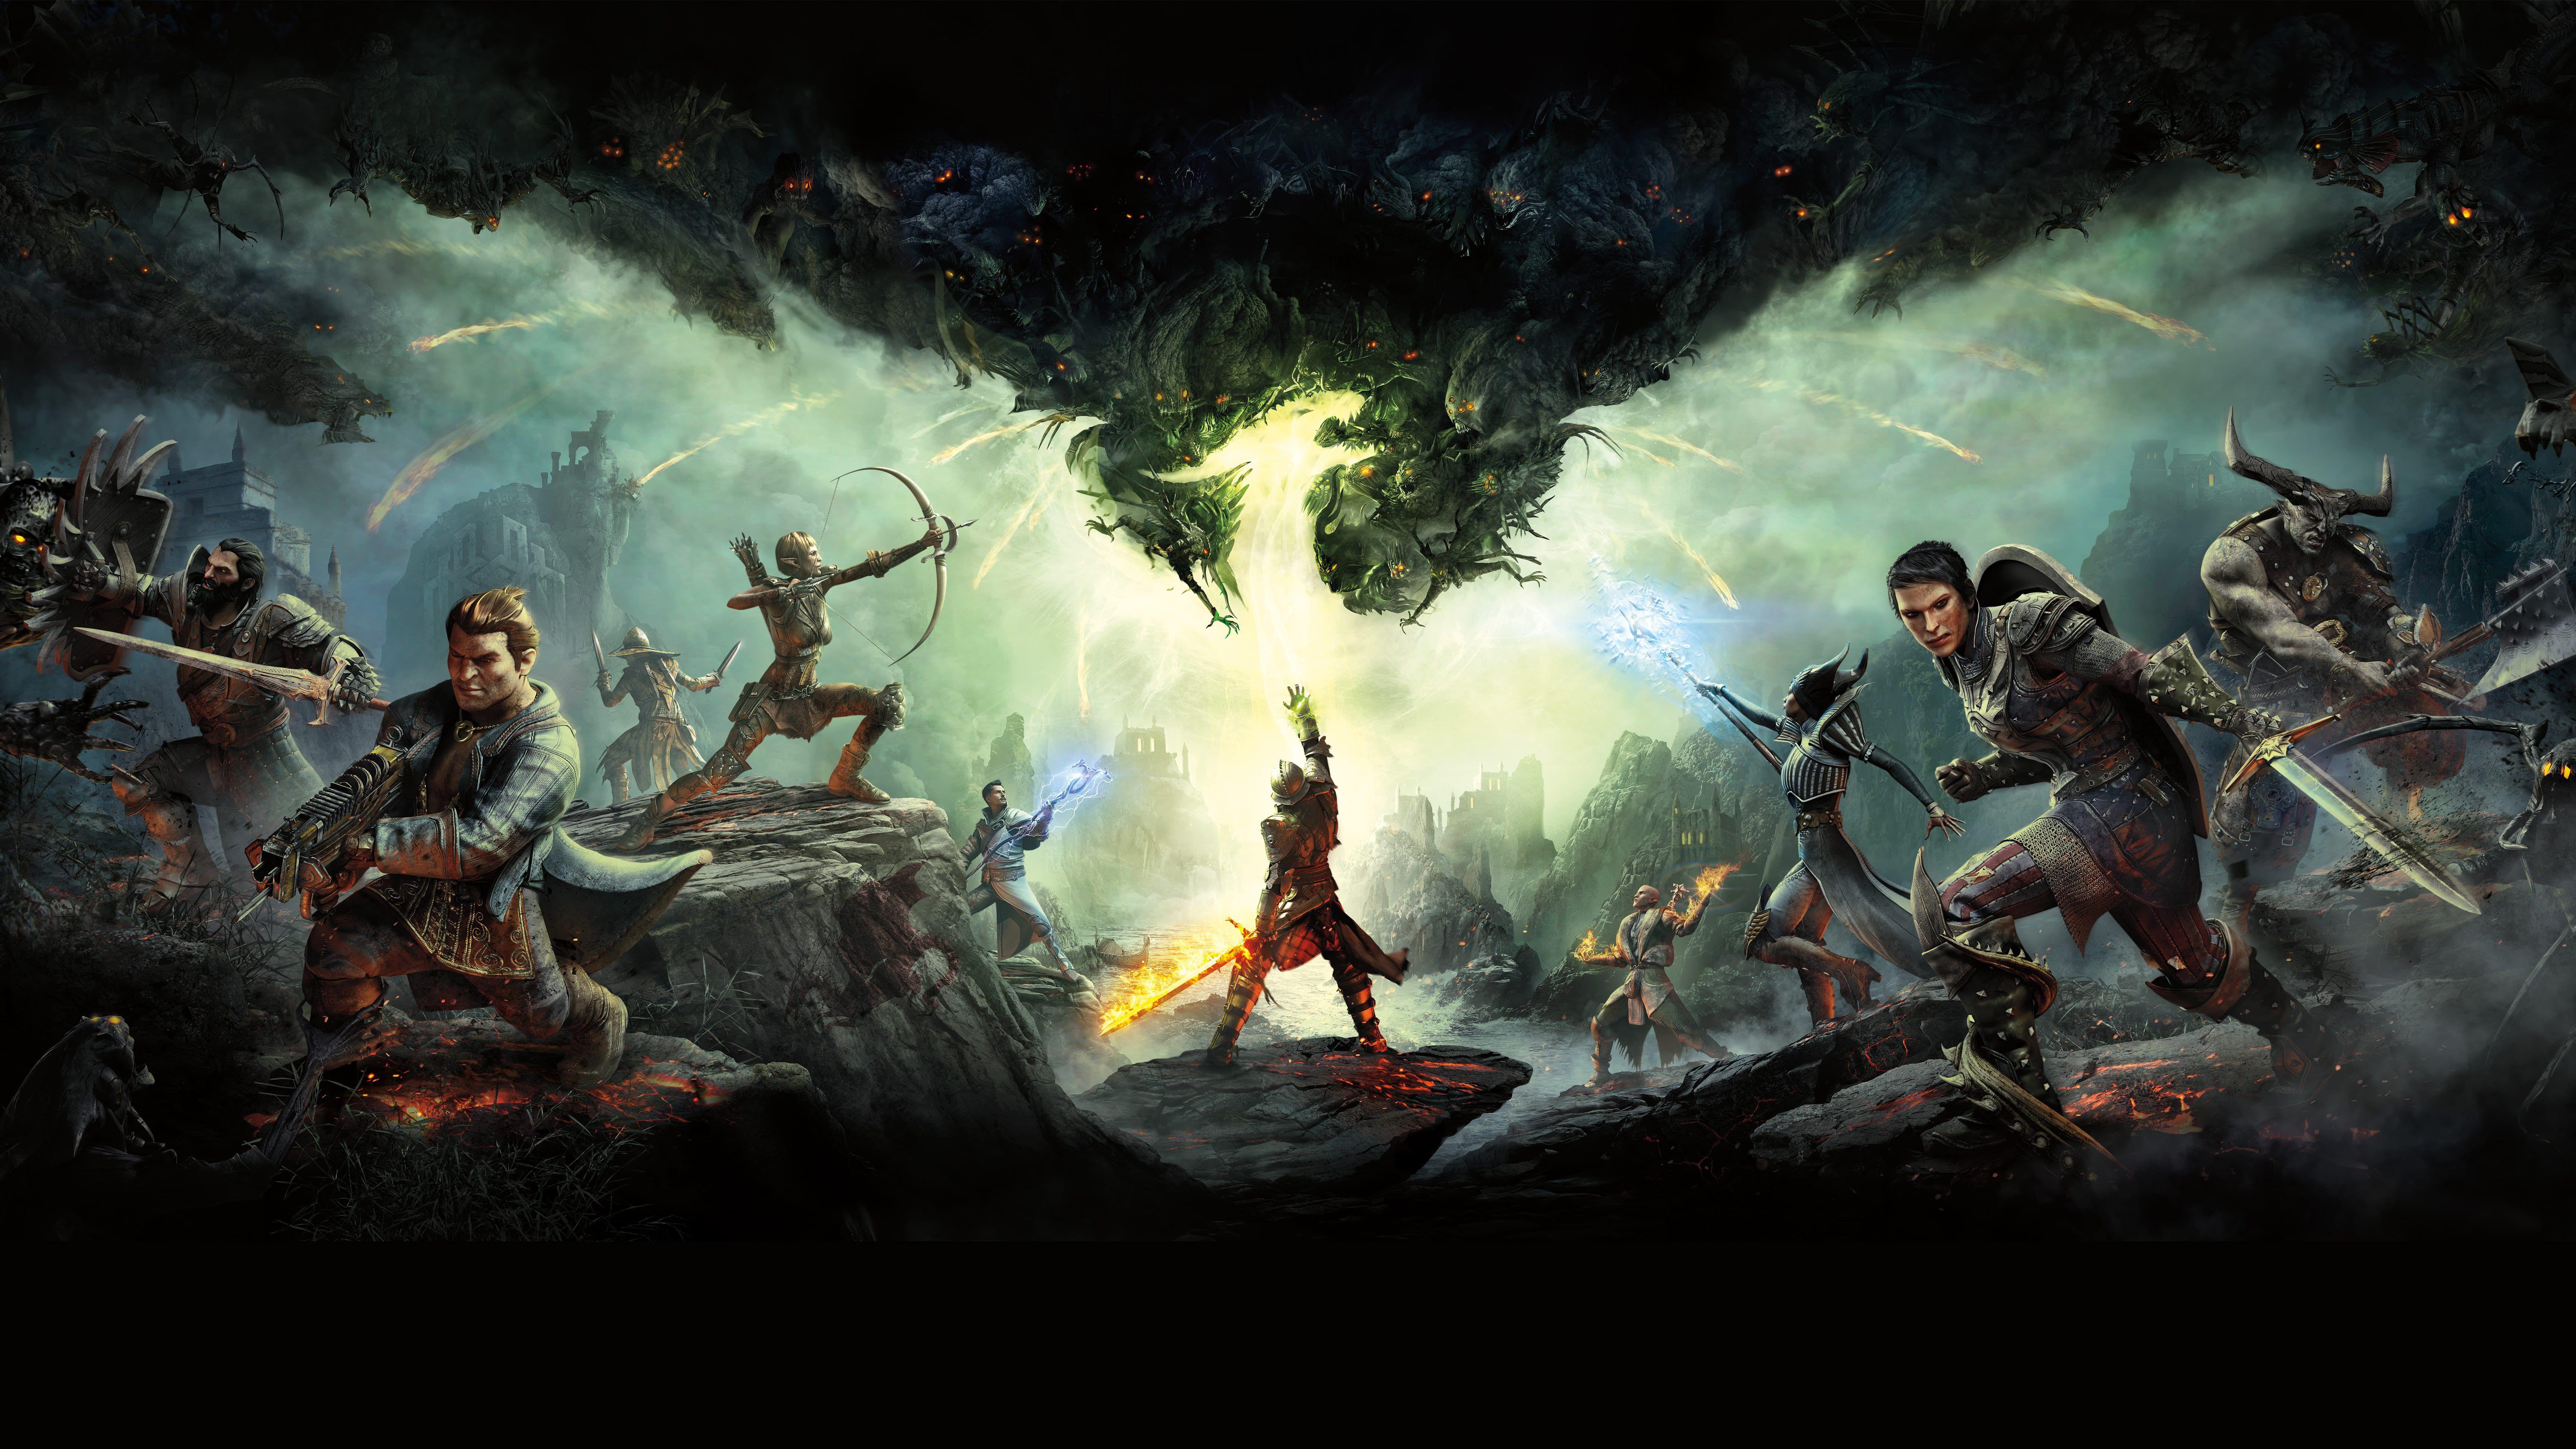 Desktophdwallpaper Org Dragon Age Dragon Age Inquisition Dragon Age 4